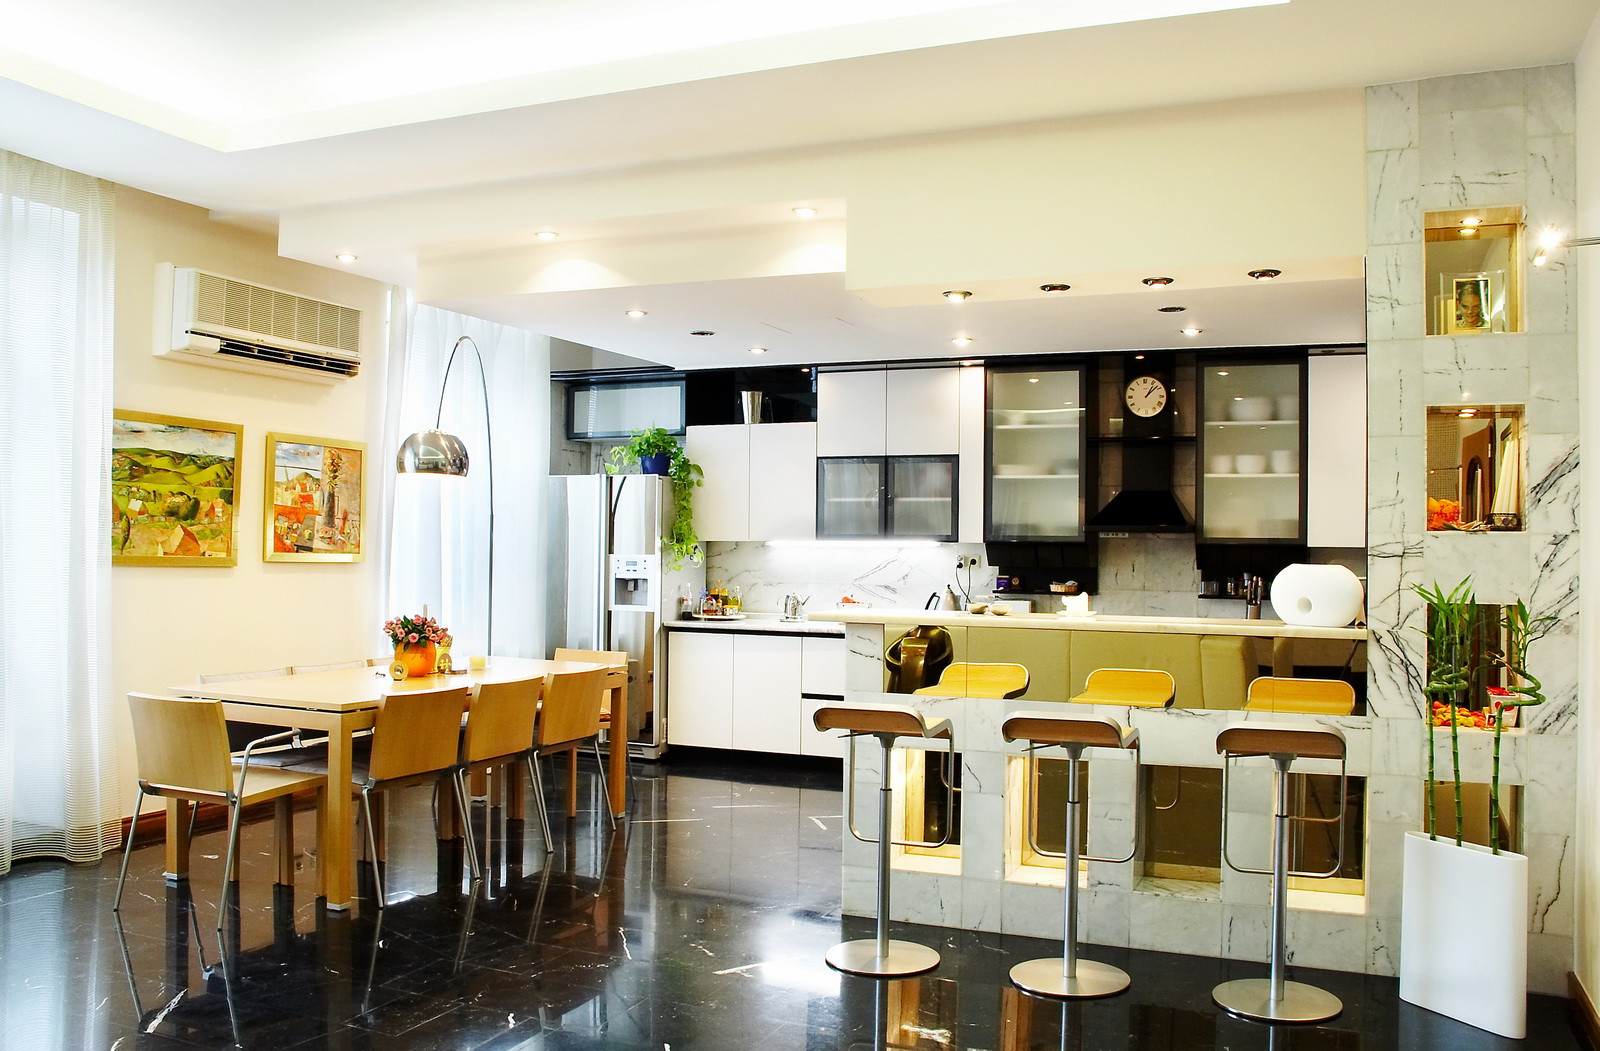 Small Kitchen Dining Room Ideas  13 Dining Room and Kitchen Design Minimalist Dap fice